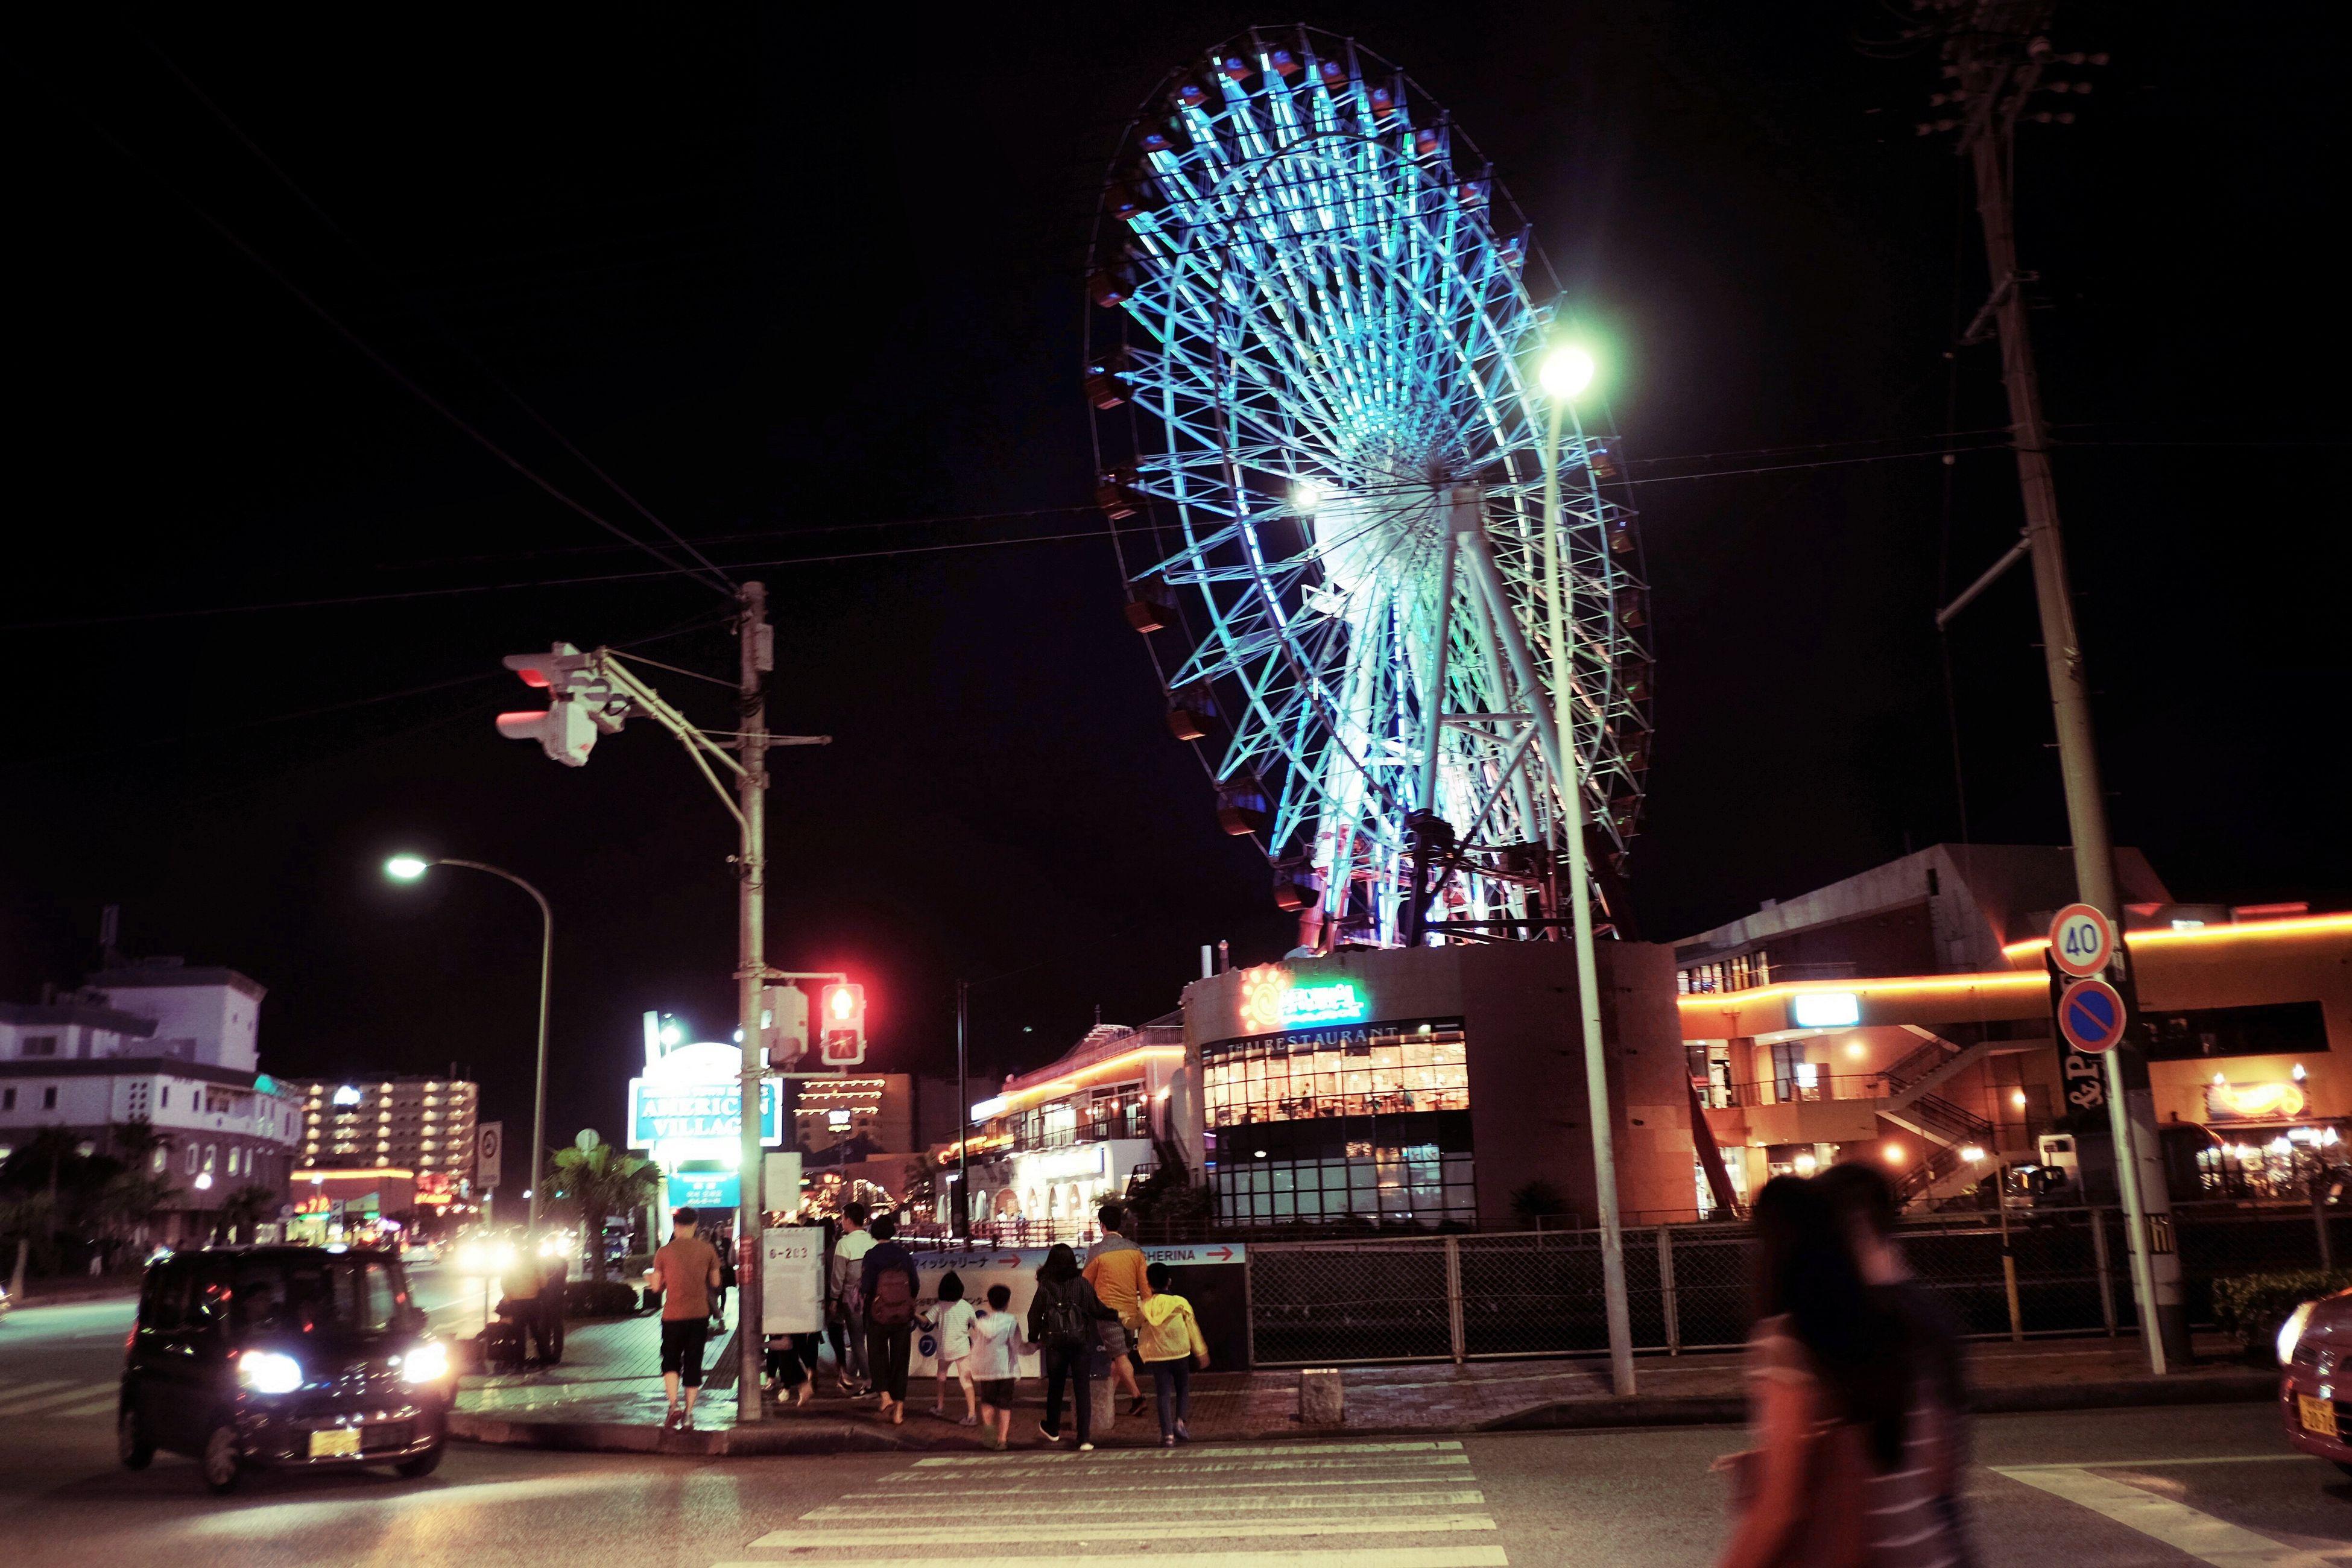 night, illuminated, city, built structure, city life, lighting equipment, lifestyles, street light, leisure activity, sky, outdoors, city street, glowing, travel destinations